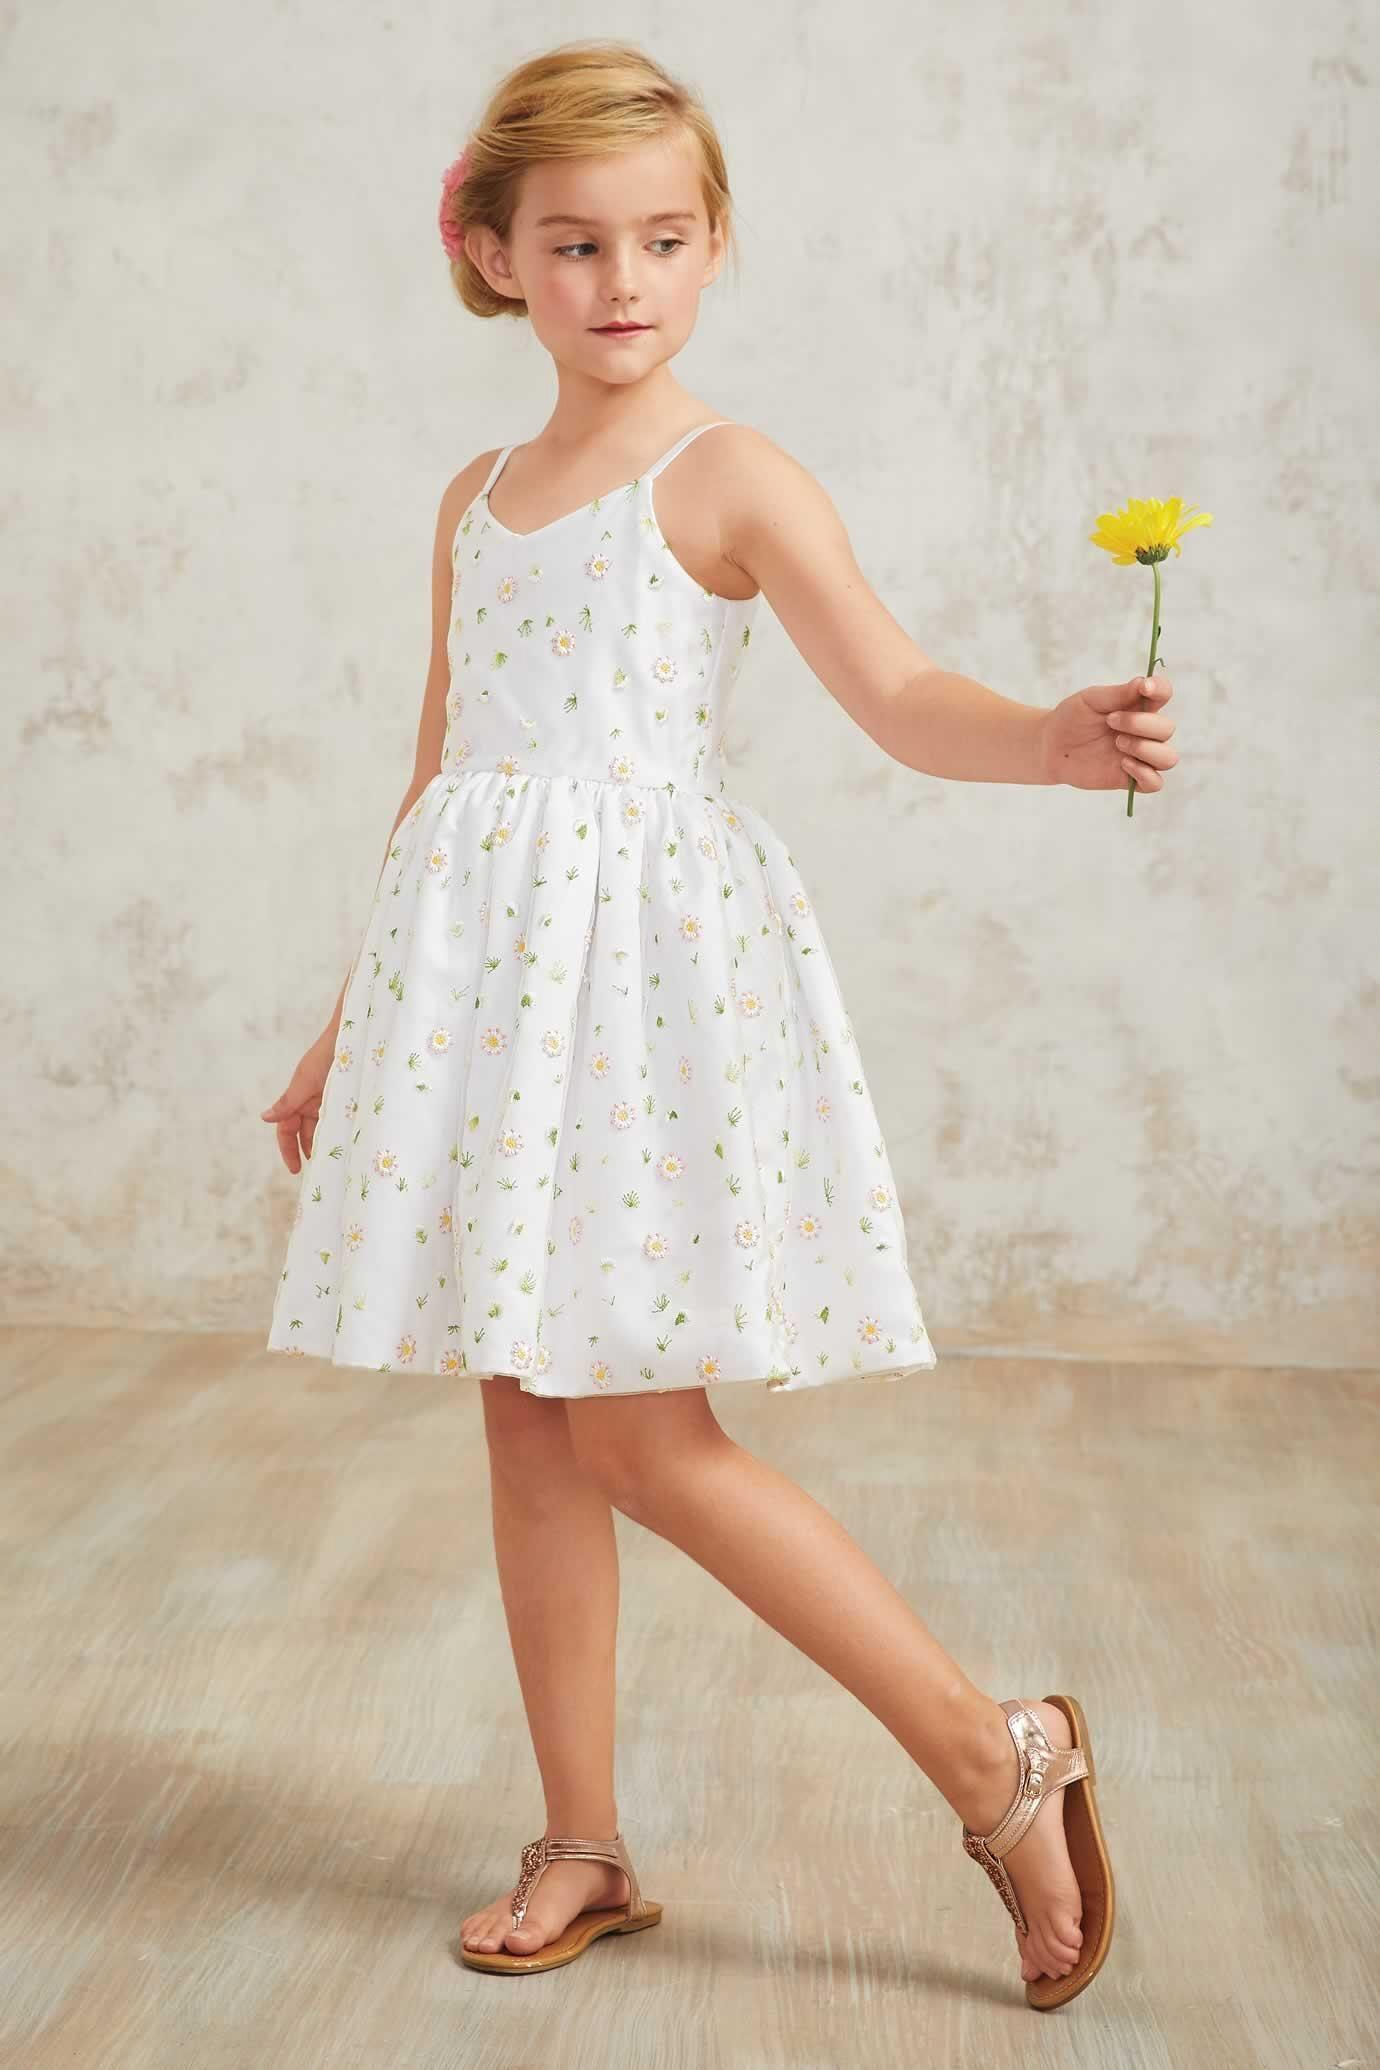 c9b4d9ed74b5 Girls Scattered Flowers Dress: #Chasingfireflies $99.00$46.00$20.00$62.00